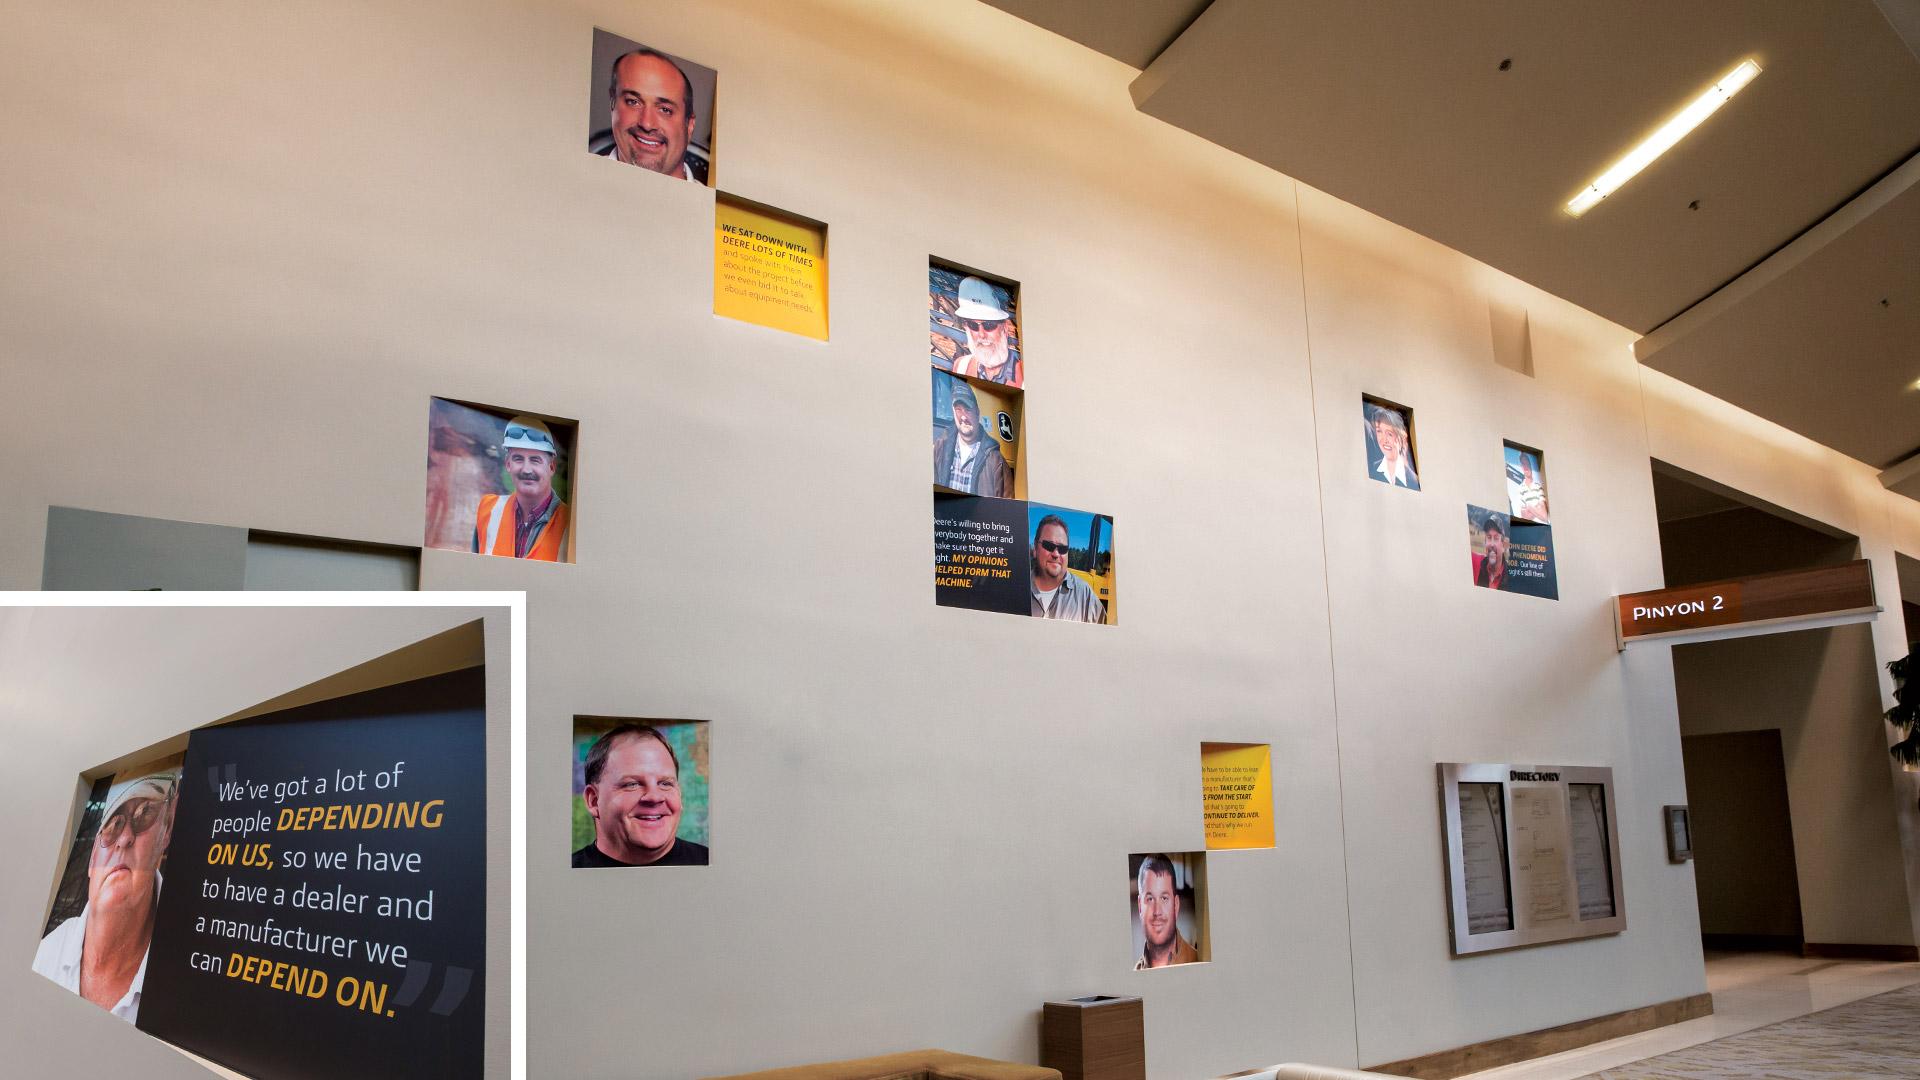 John Deere 2014 ConExpo Hospitality Event Wall Testimonial Graphics